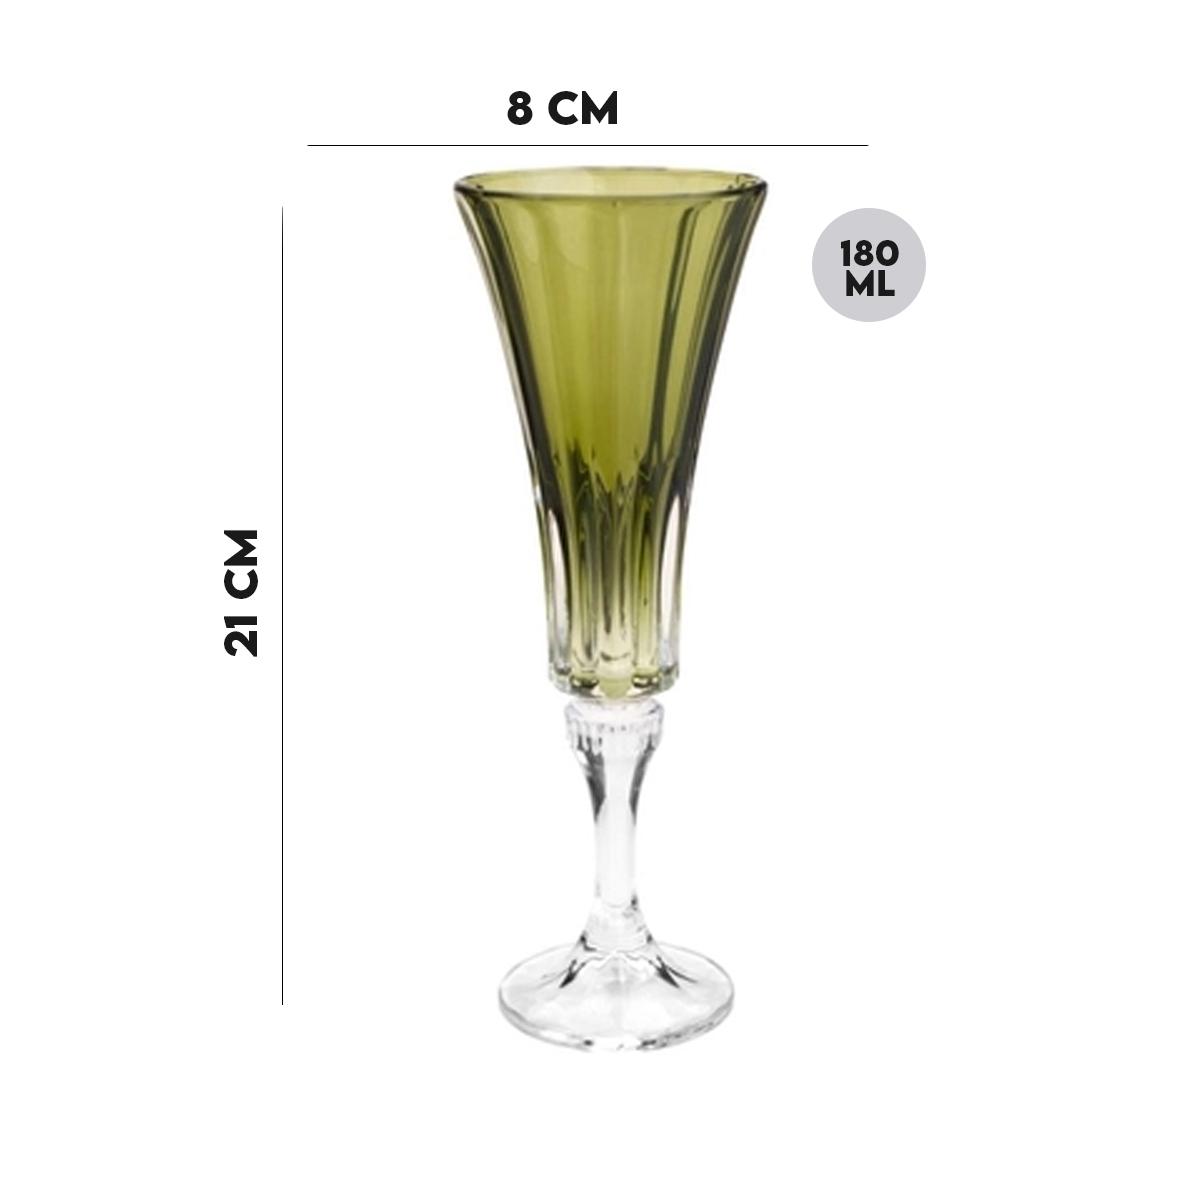 Taça Cristal Ecologico para Champagne 180 ml  - Lemis